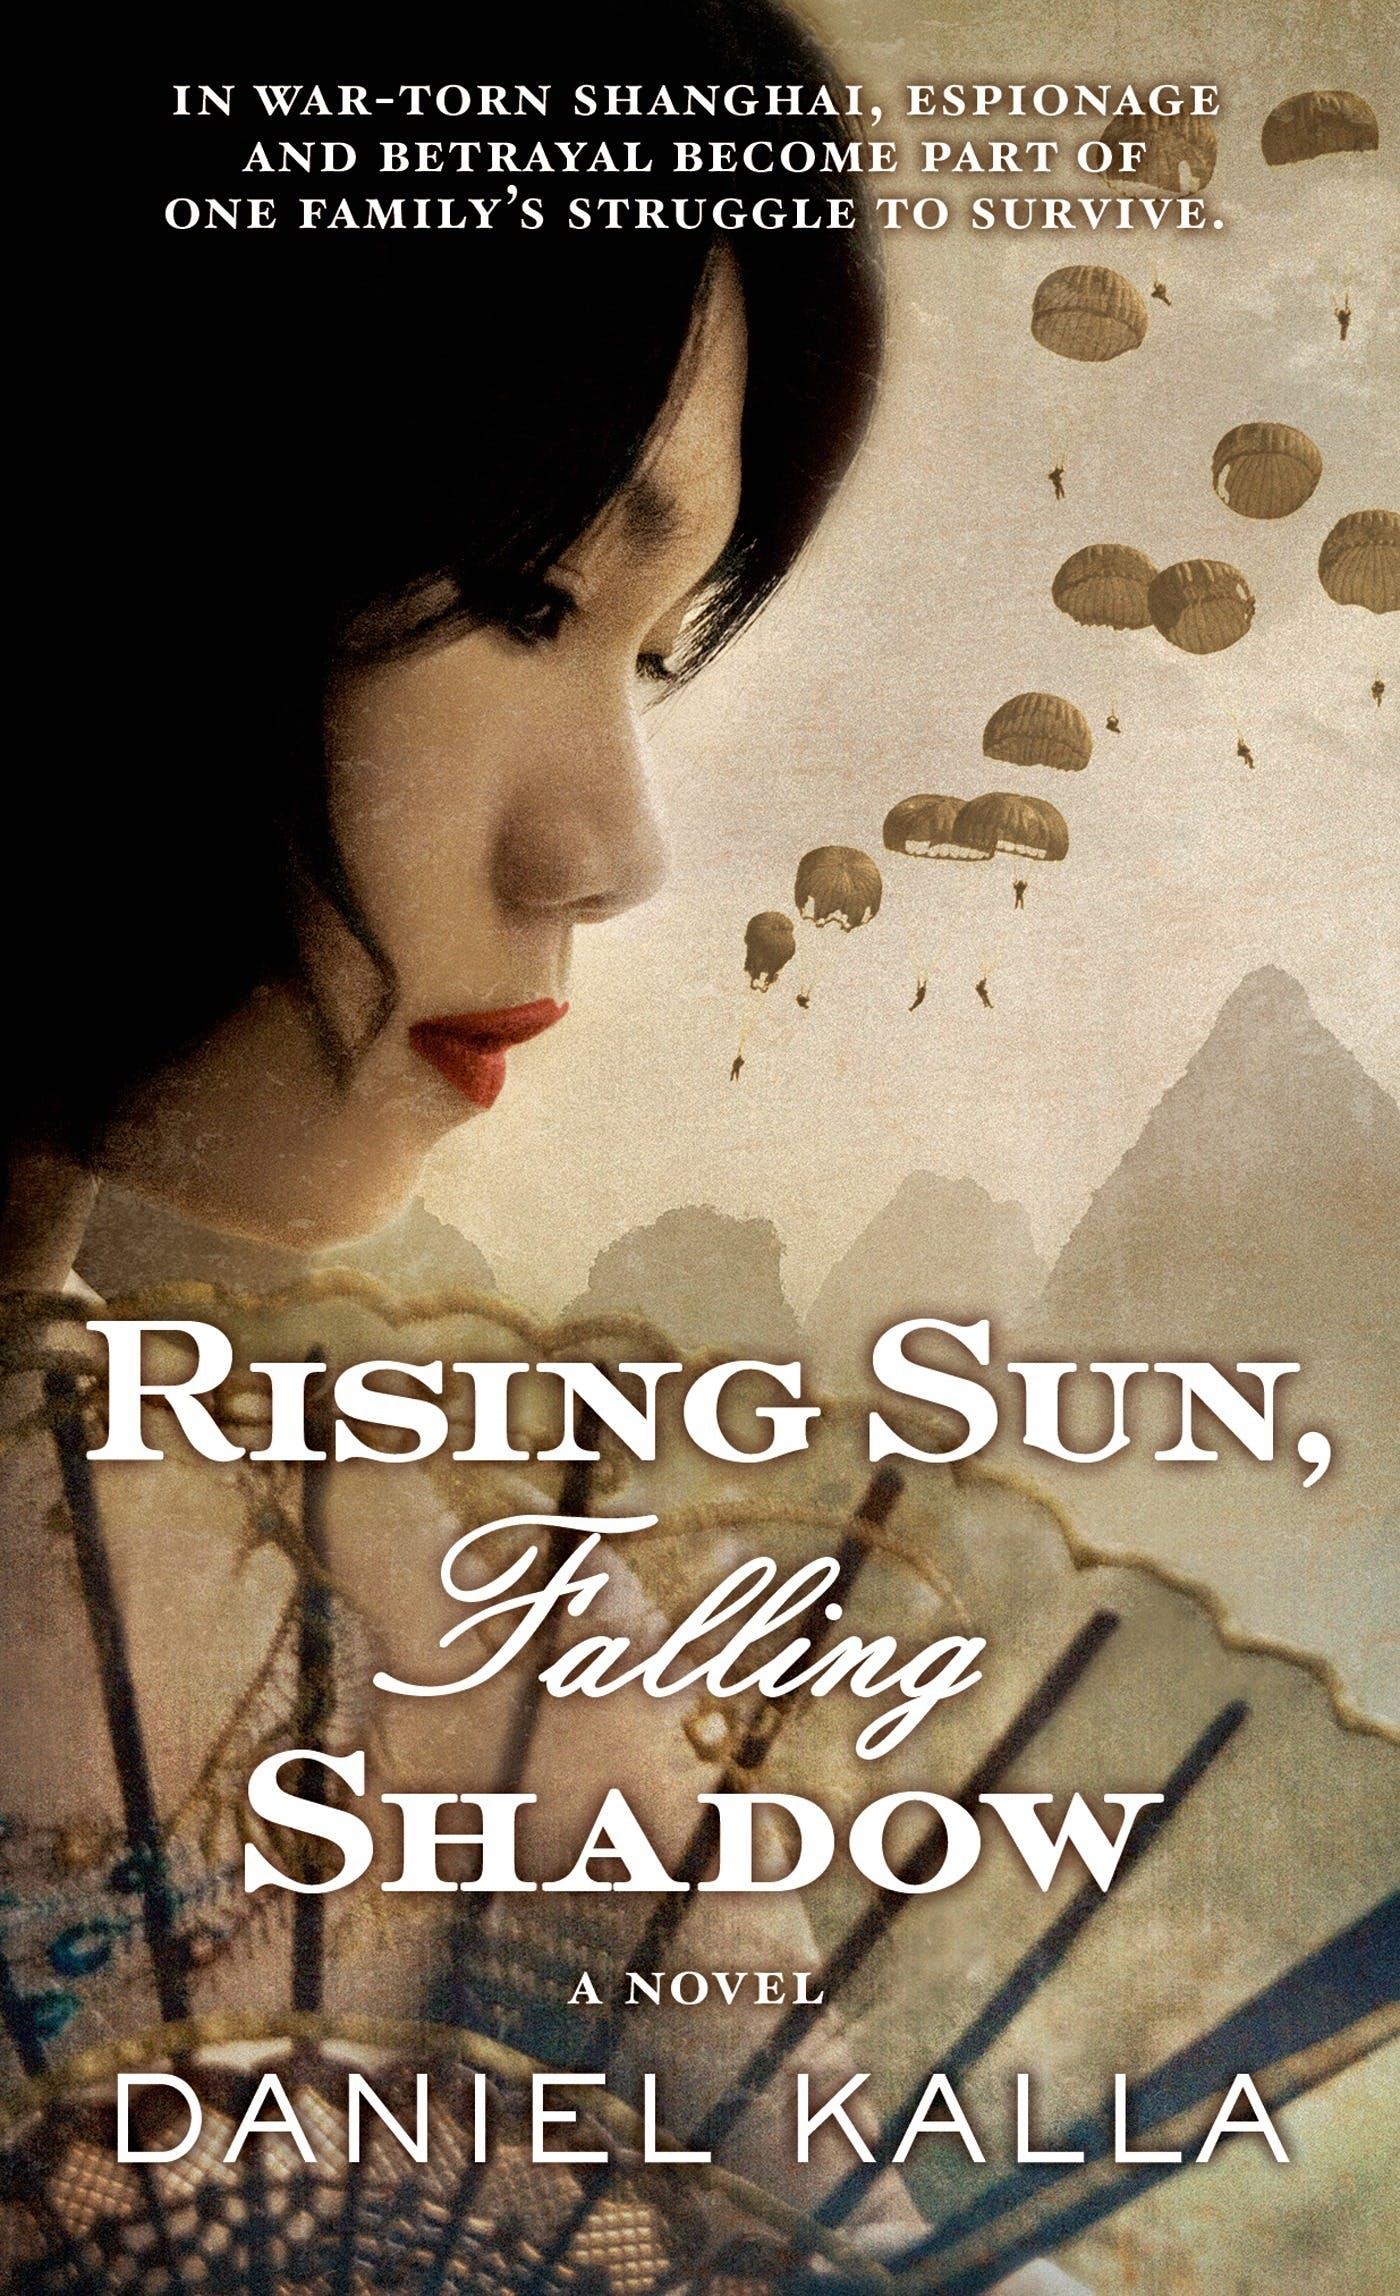 Image of Rising Sun, Falling Shadow